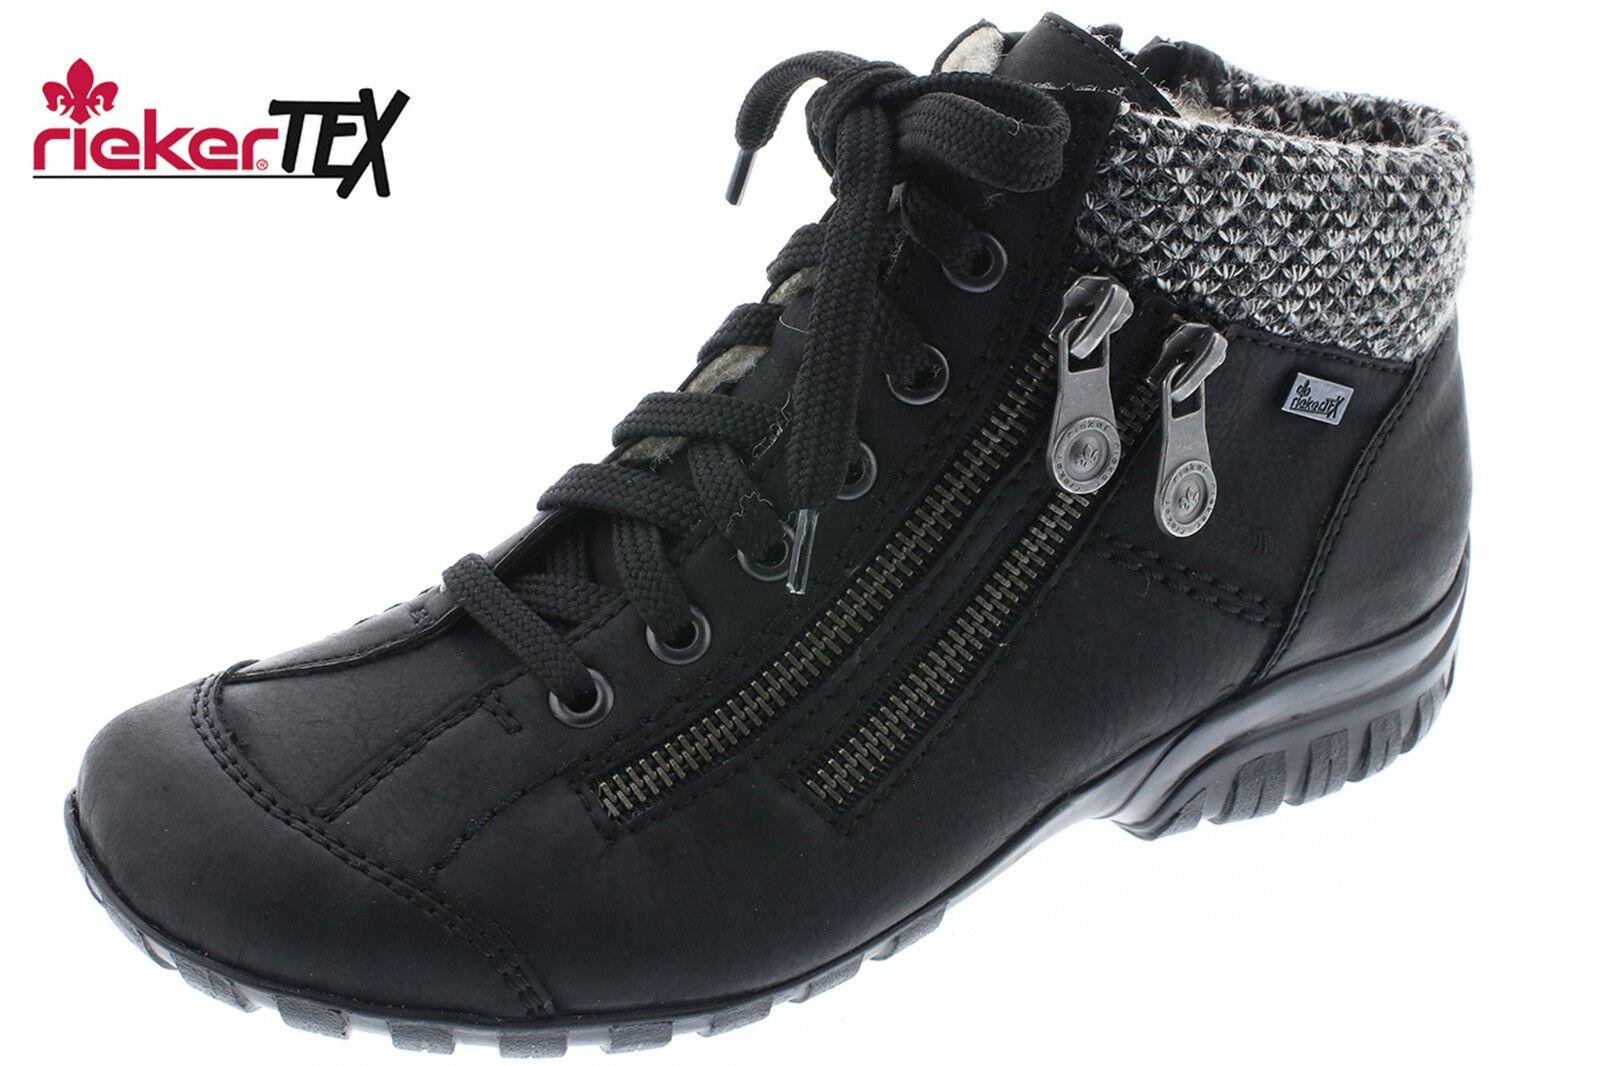 Rieker Tex Damen Stiefel Schwarz Winter Sneaker Schurwollfutter L4614-01 NEU